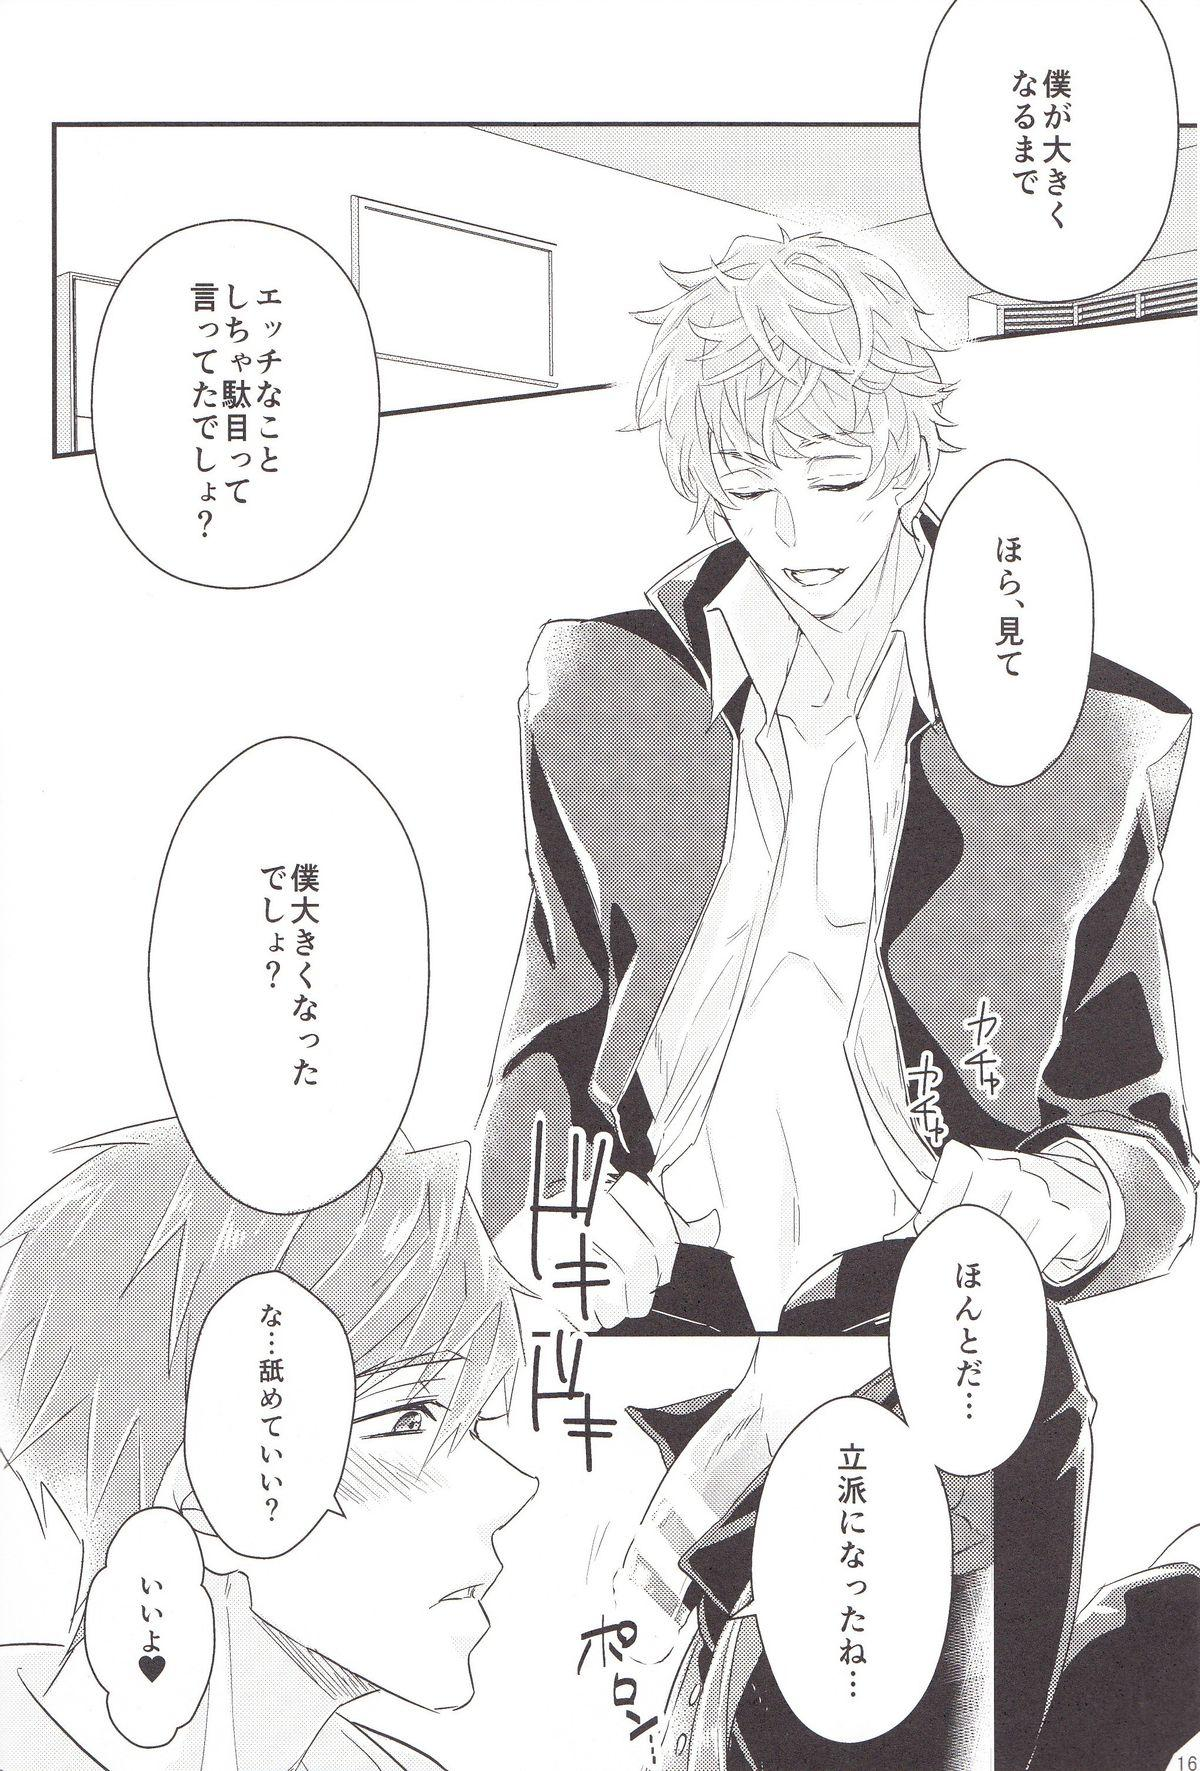 Tachibana Coach no Kojin Lesson 14